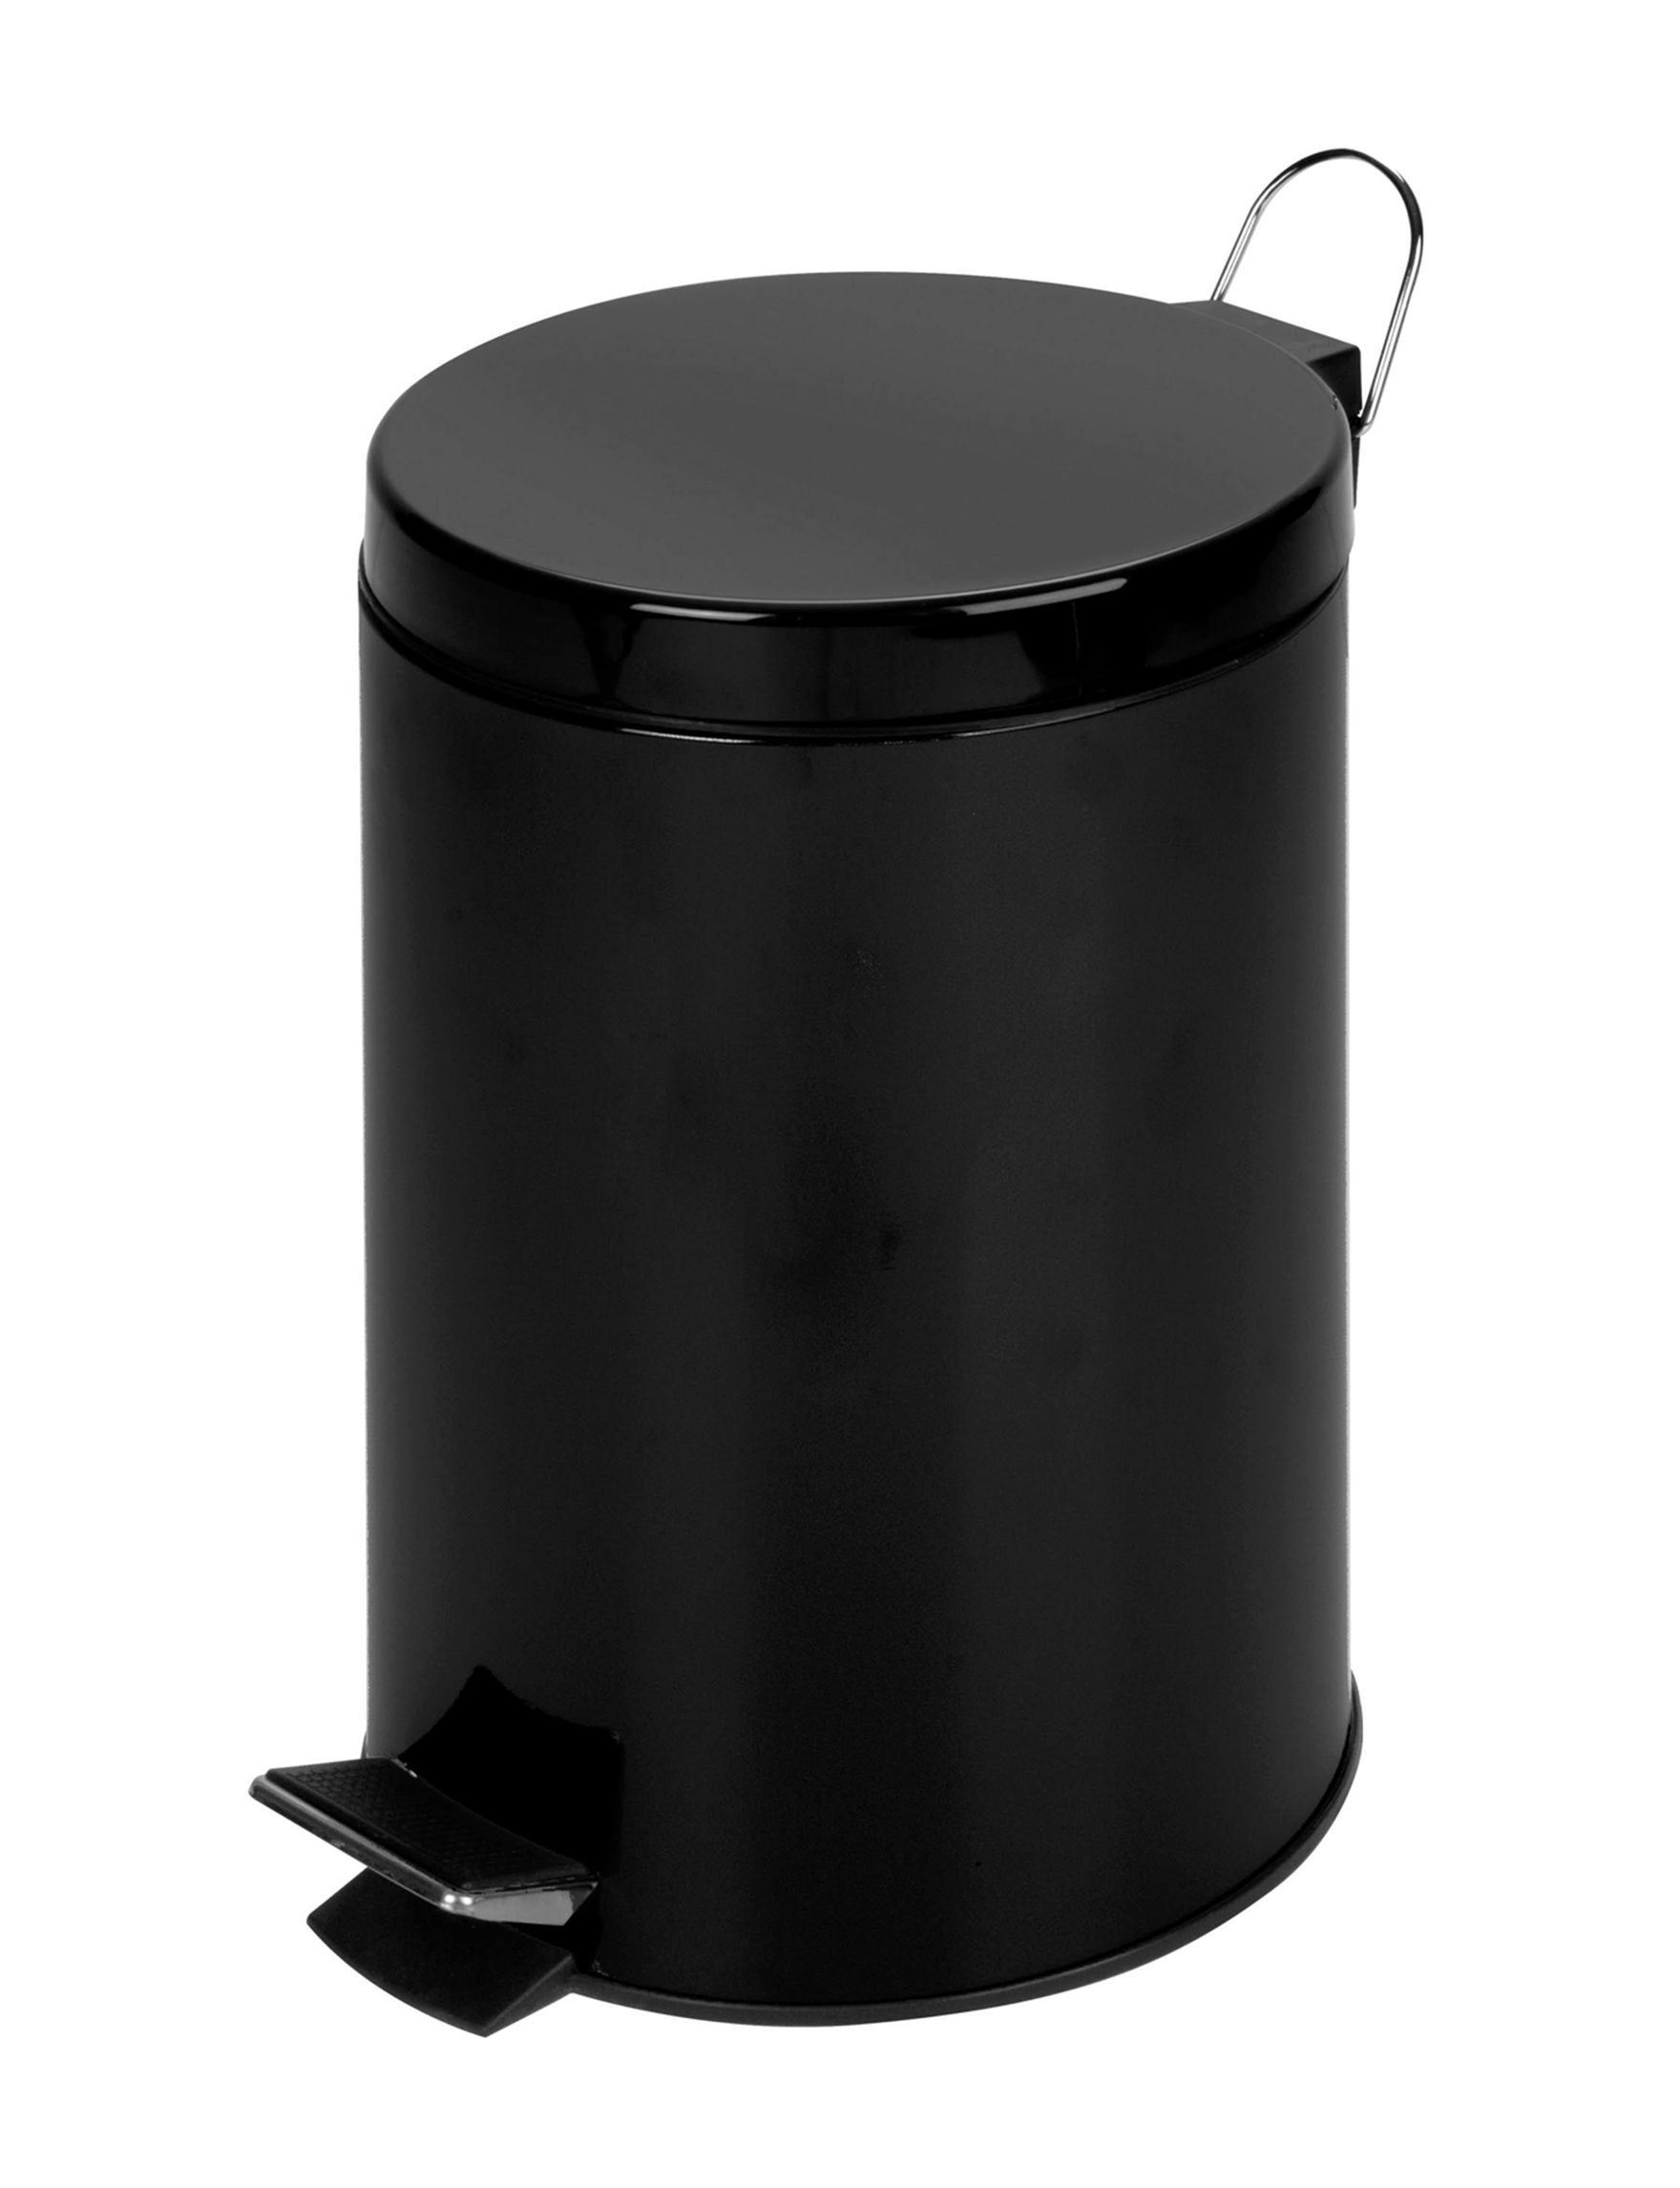 Honey-Can-Do International Black Trash & Recycling Bins Storage & Organization